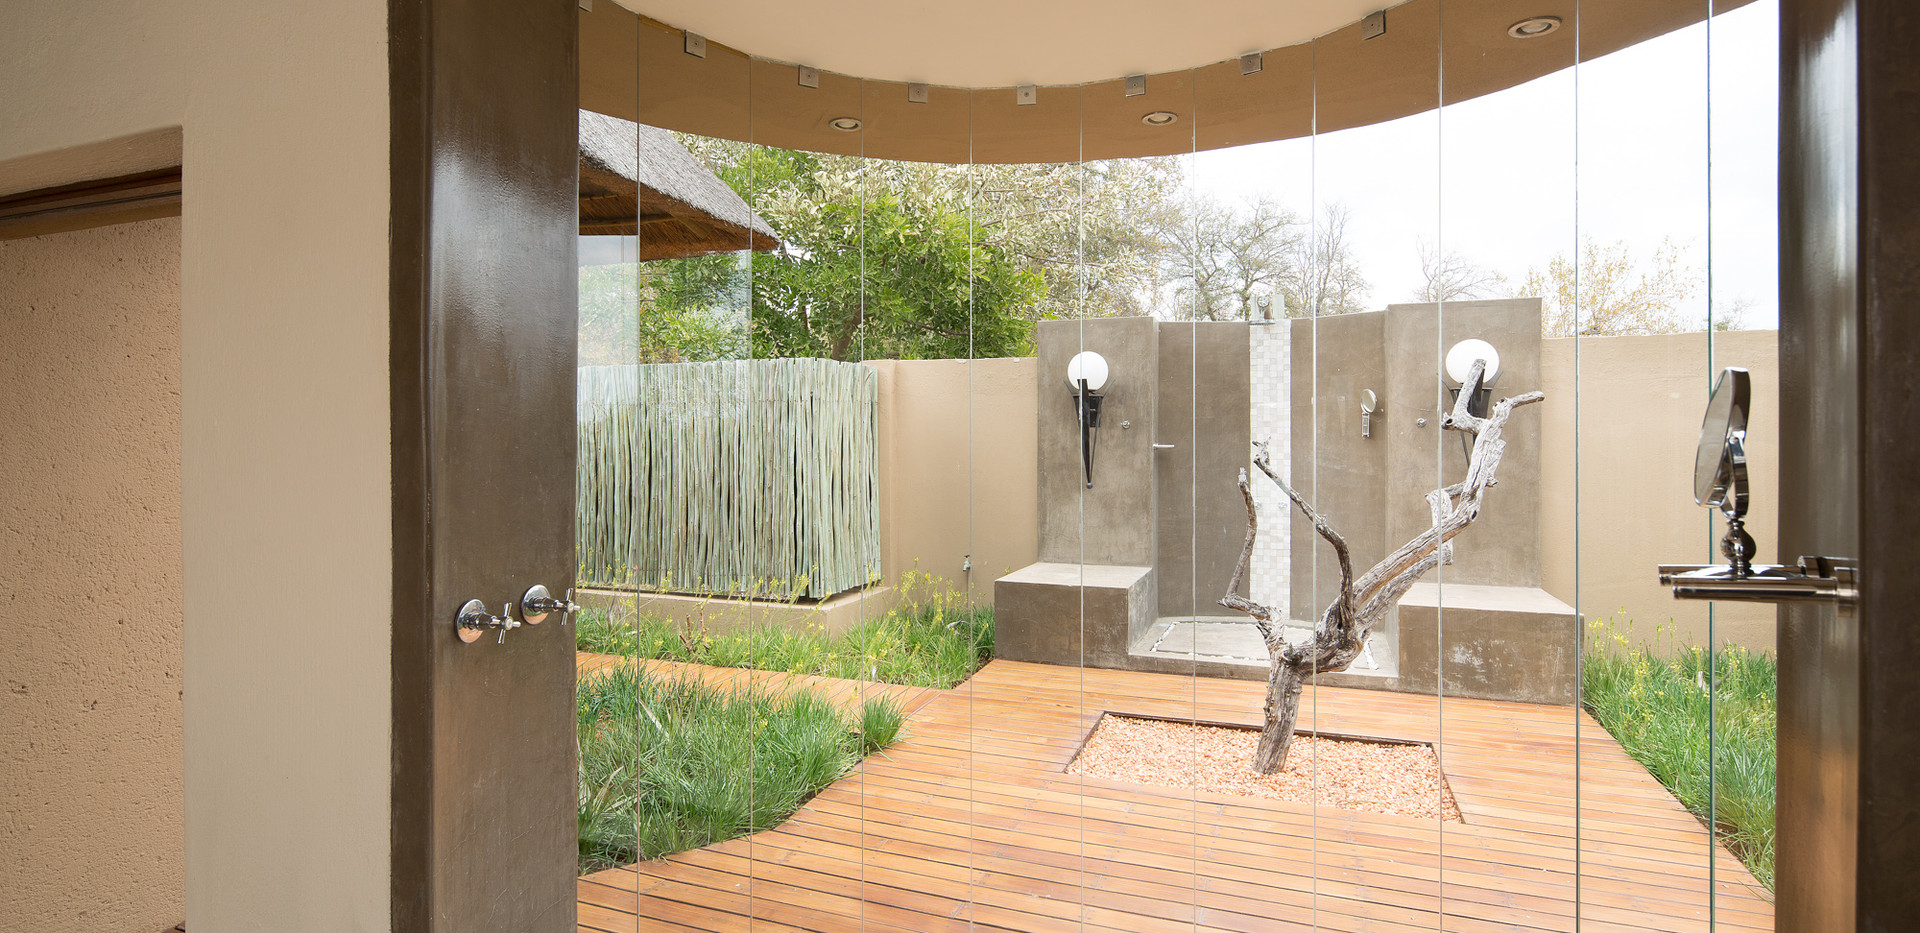 Shower inside our outside at Weaver's Nest Lodge